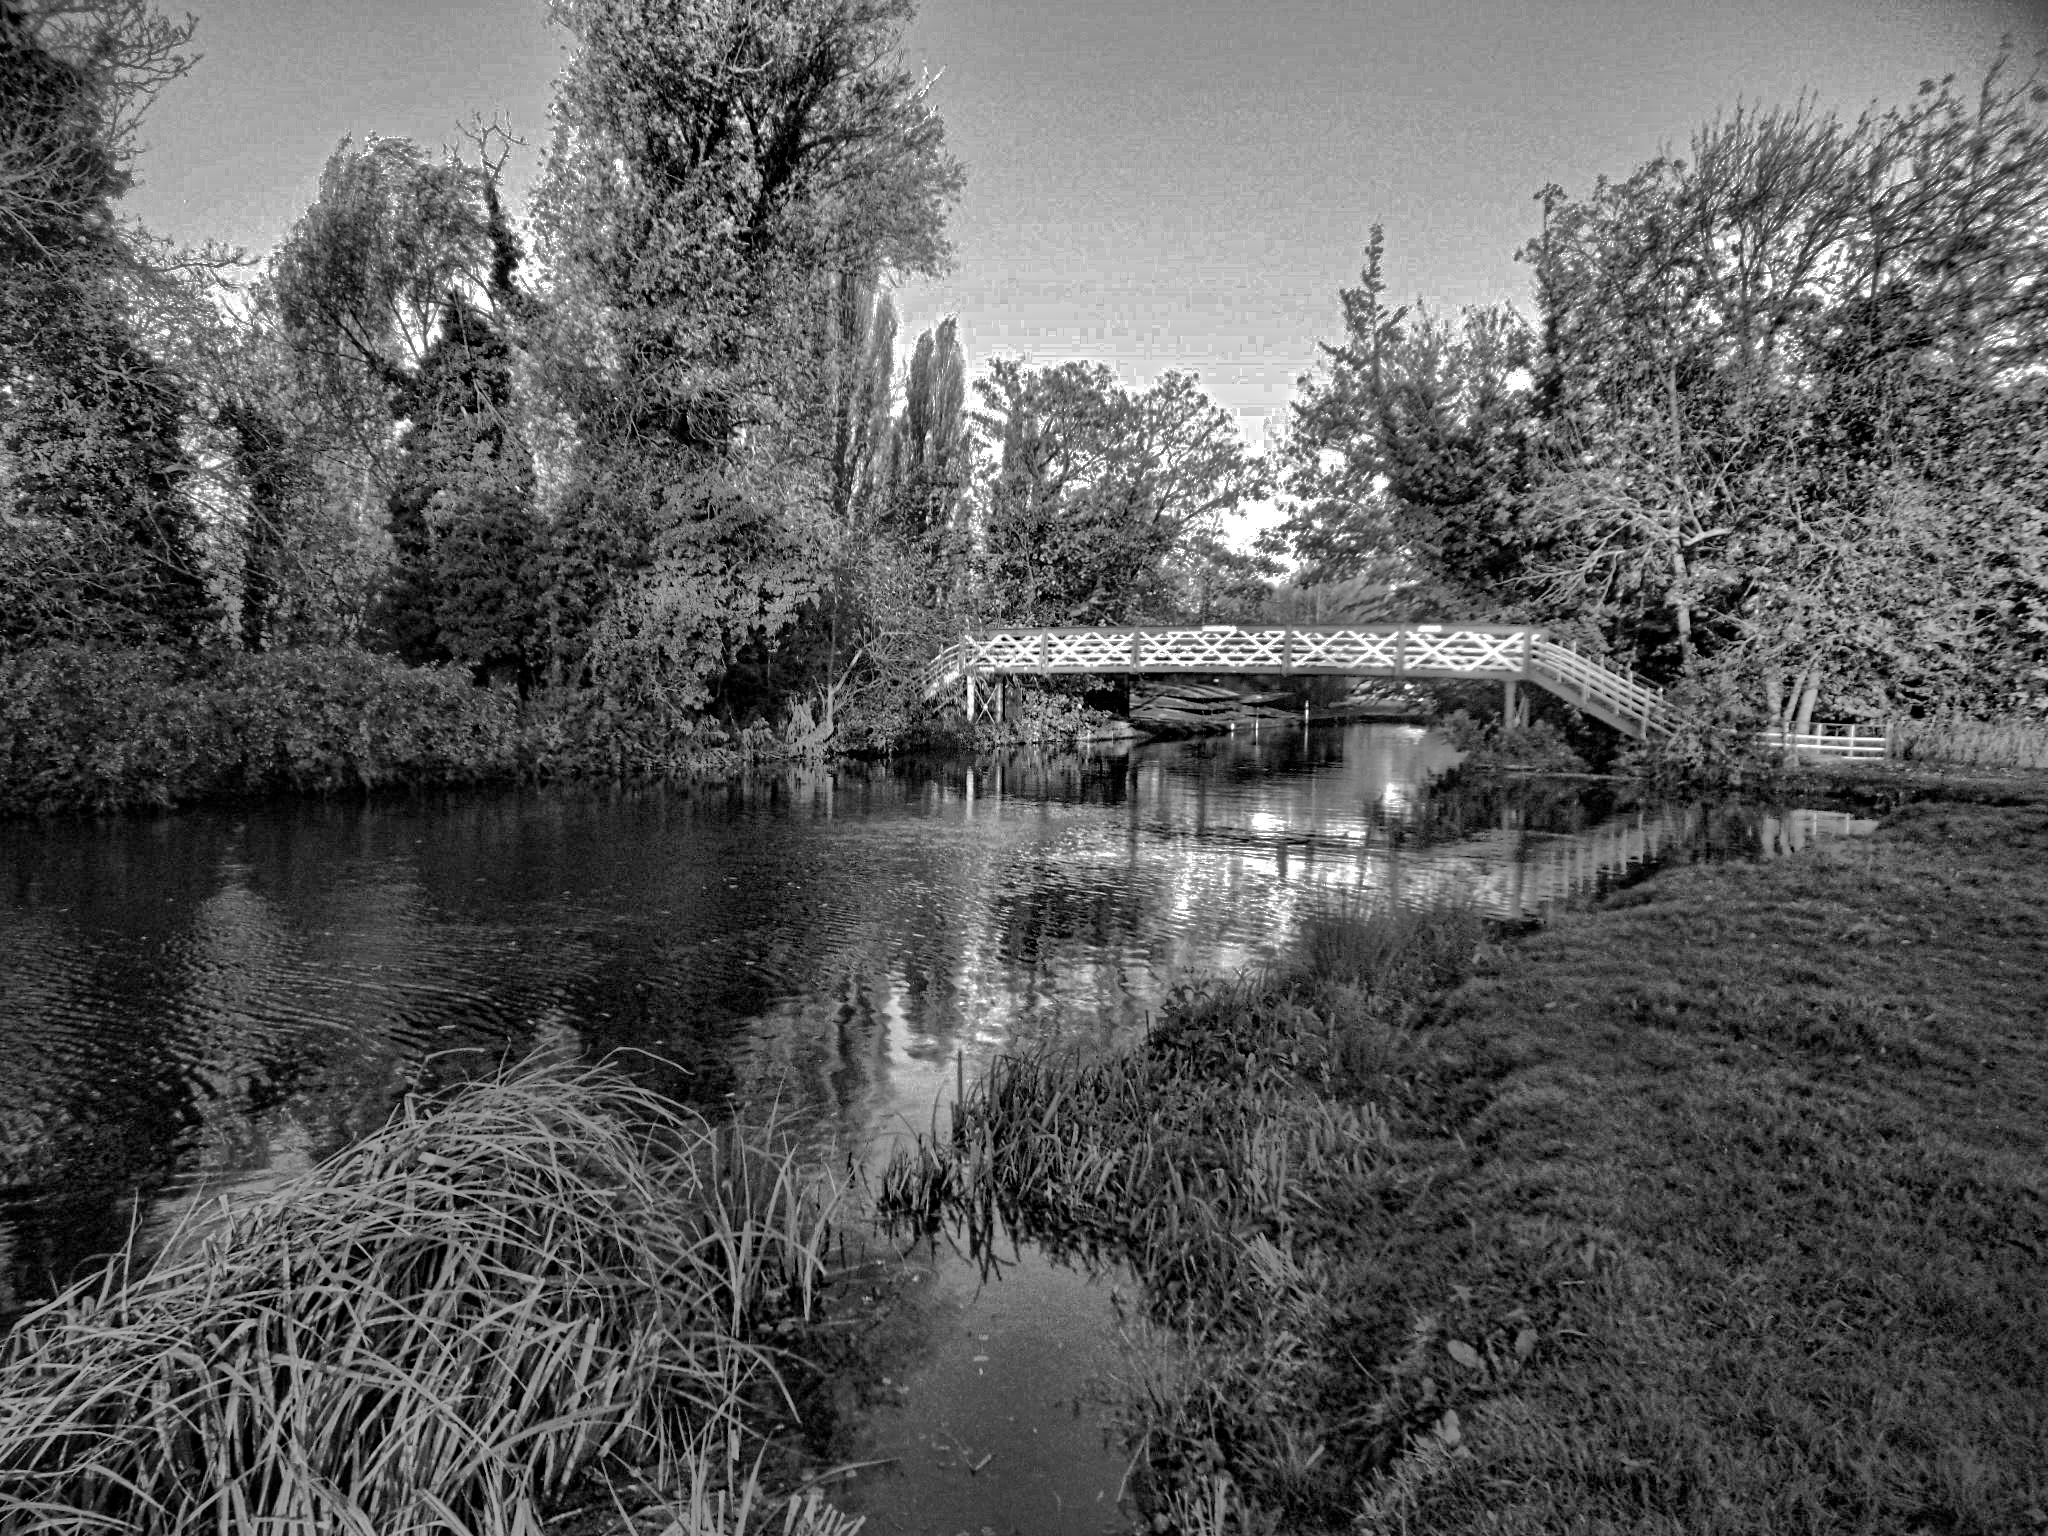 The Bridge by Simon Hill